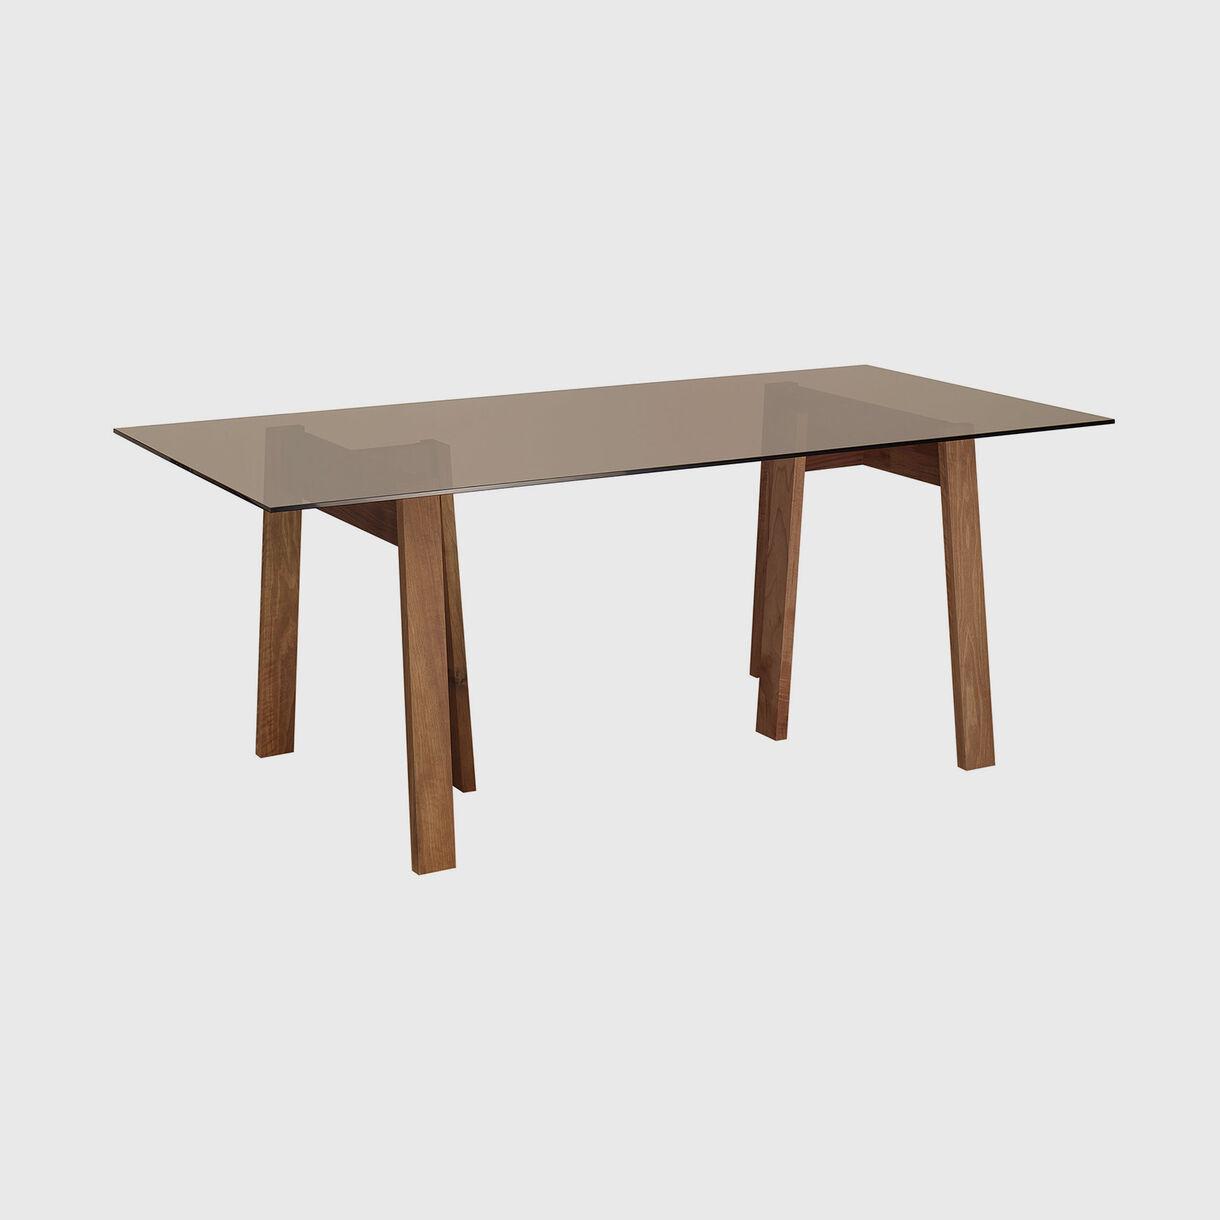 Basis Trestle Table